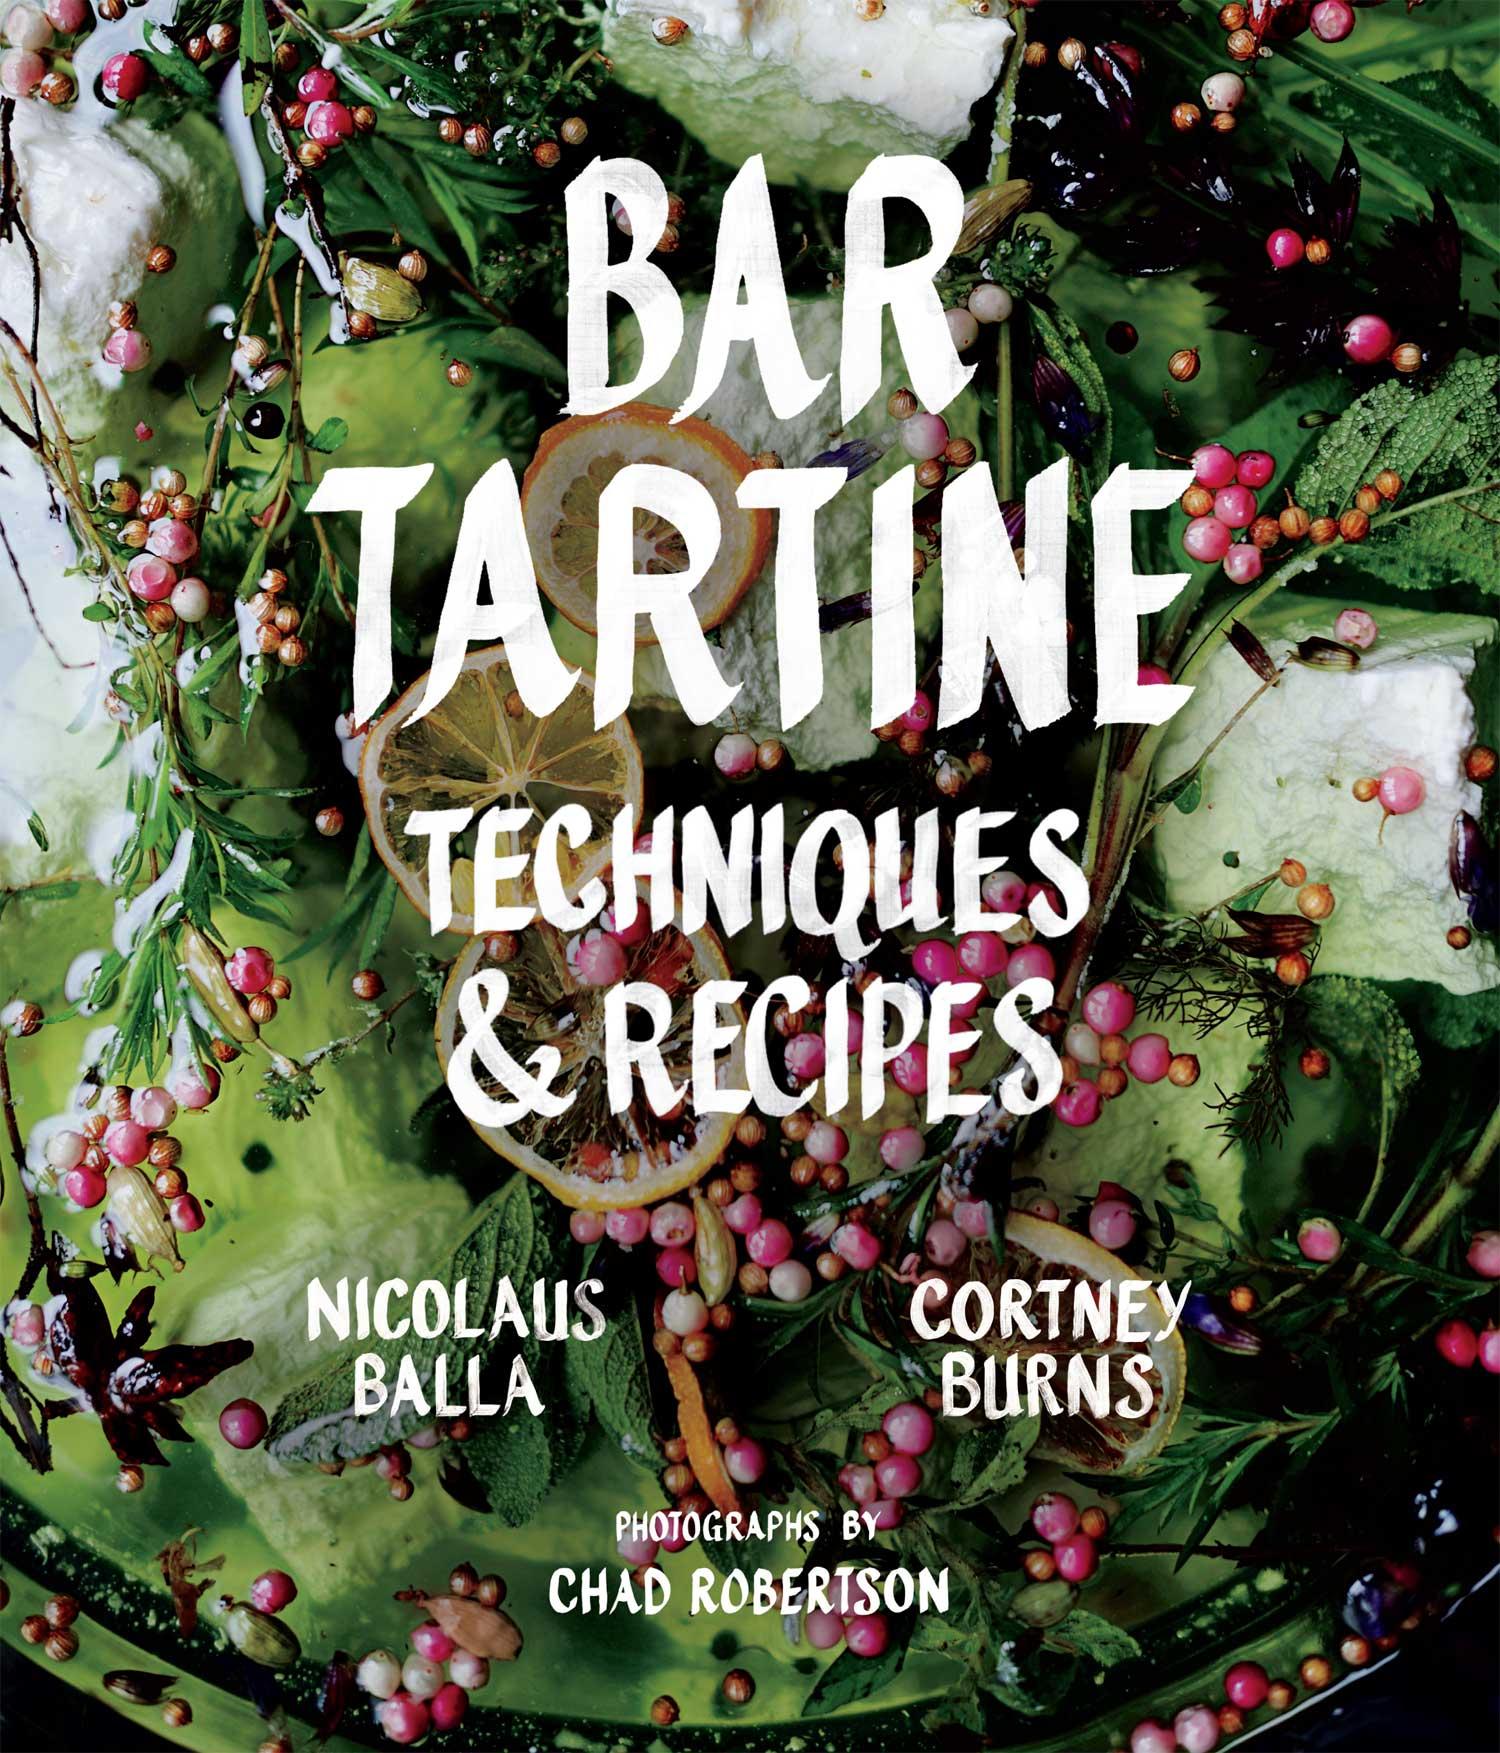 Bar Tartine Techniques & Recipes